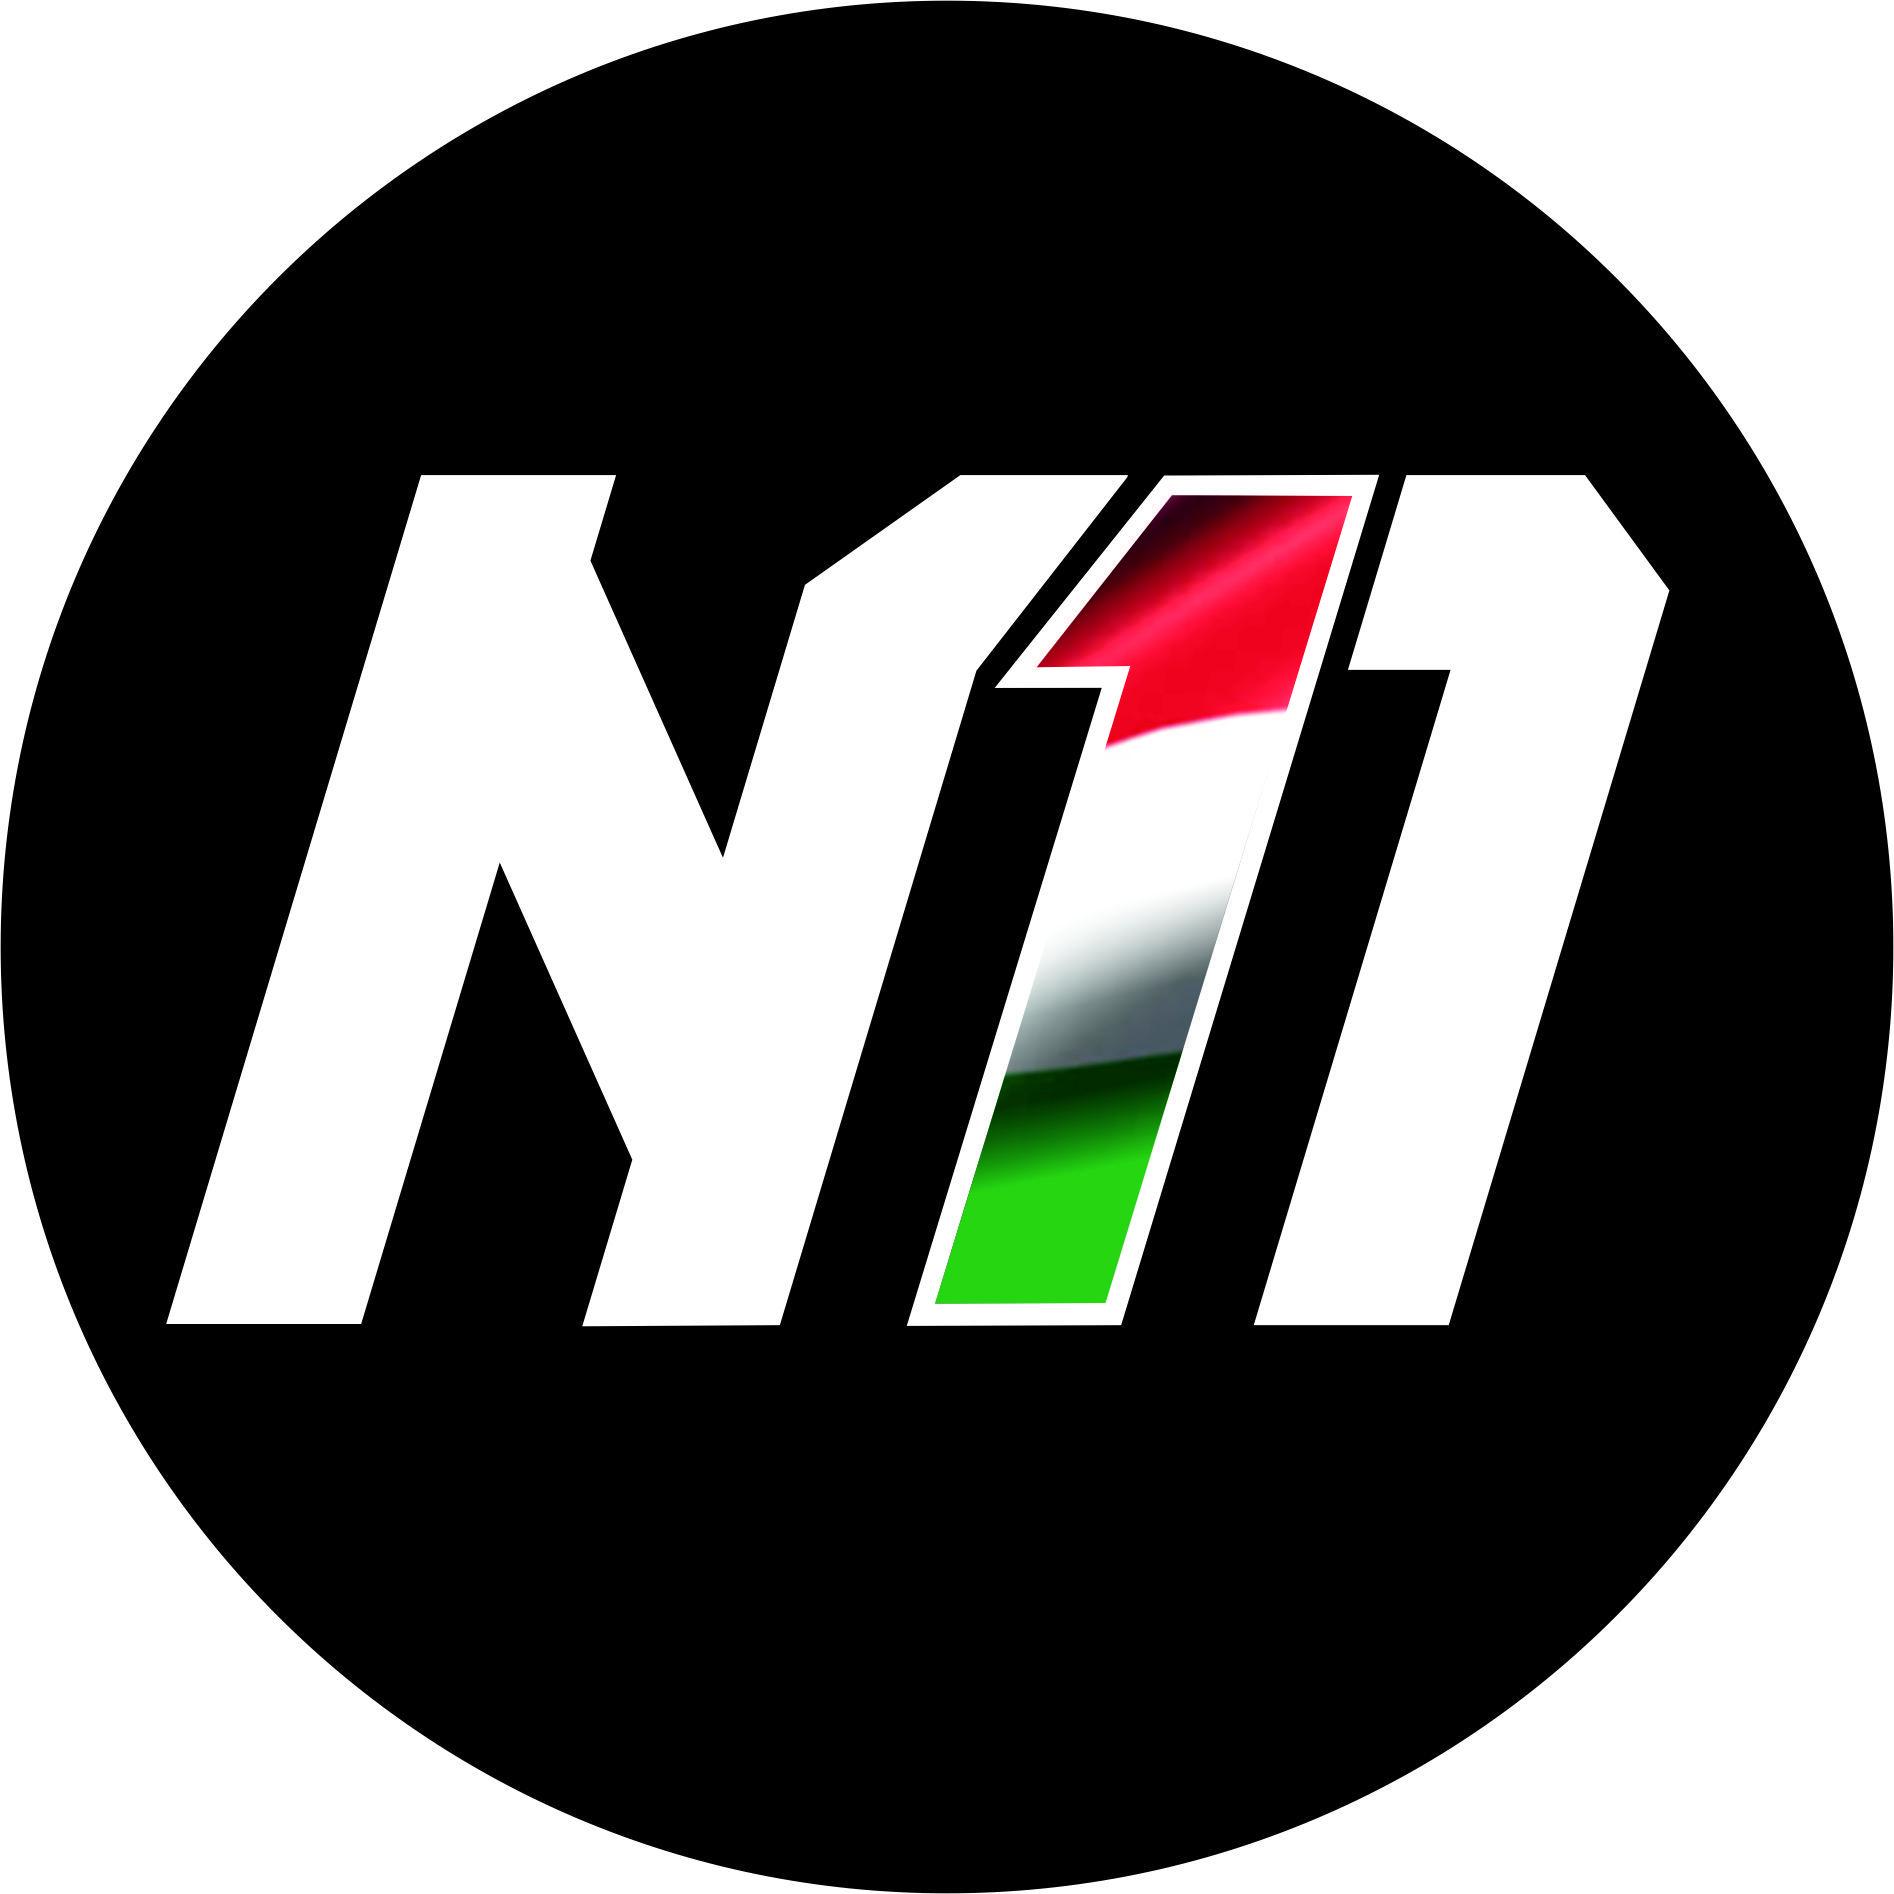 Norbert Michelisz 2020 logo